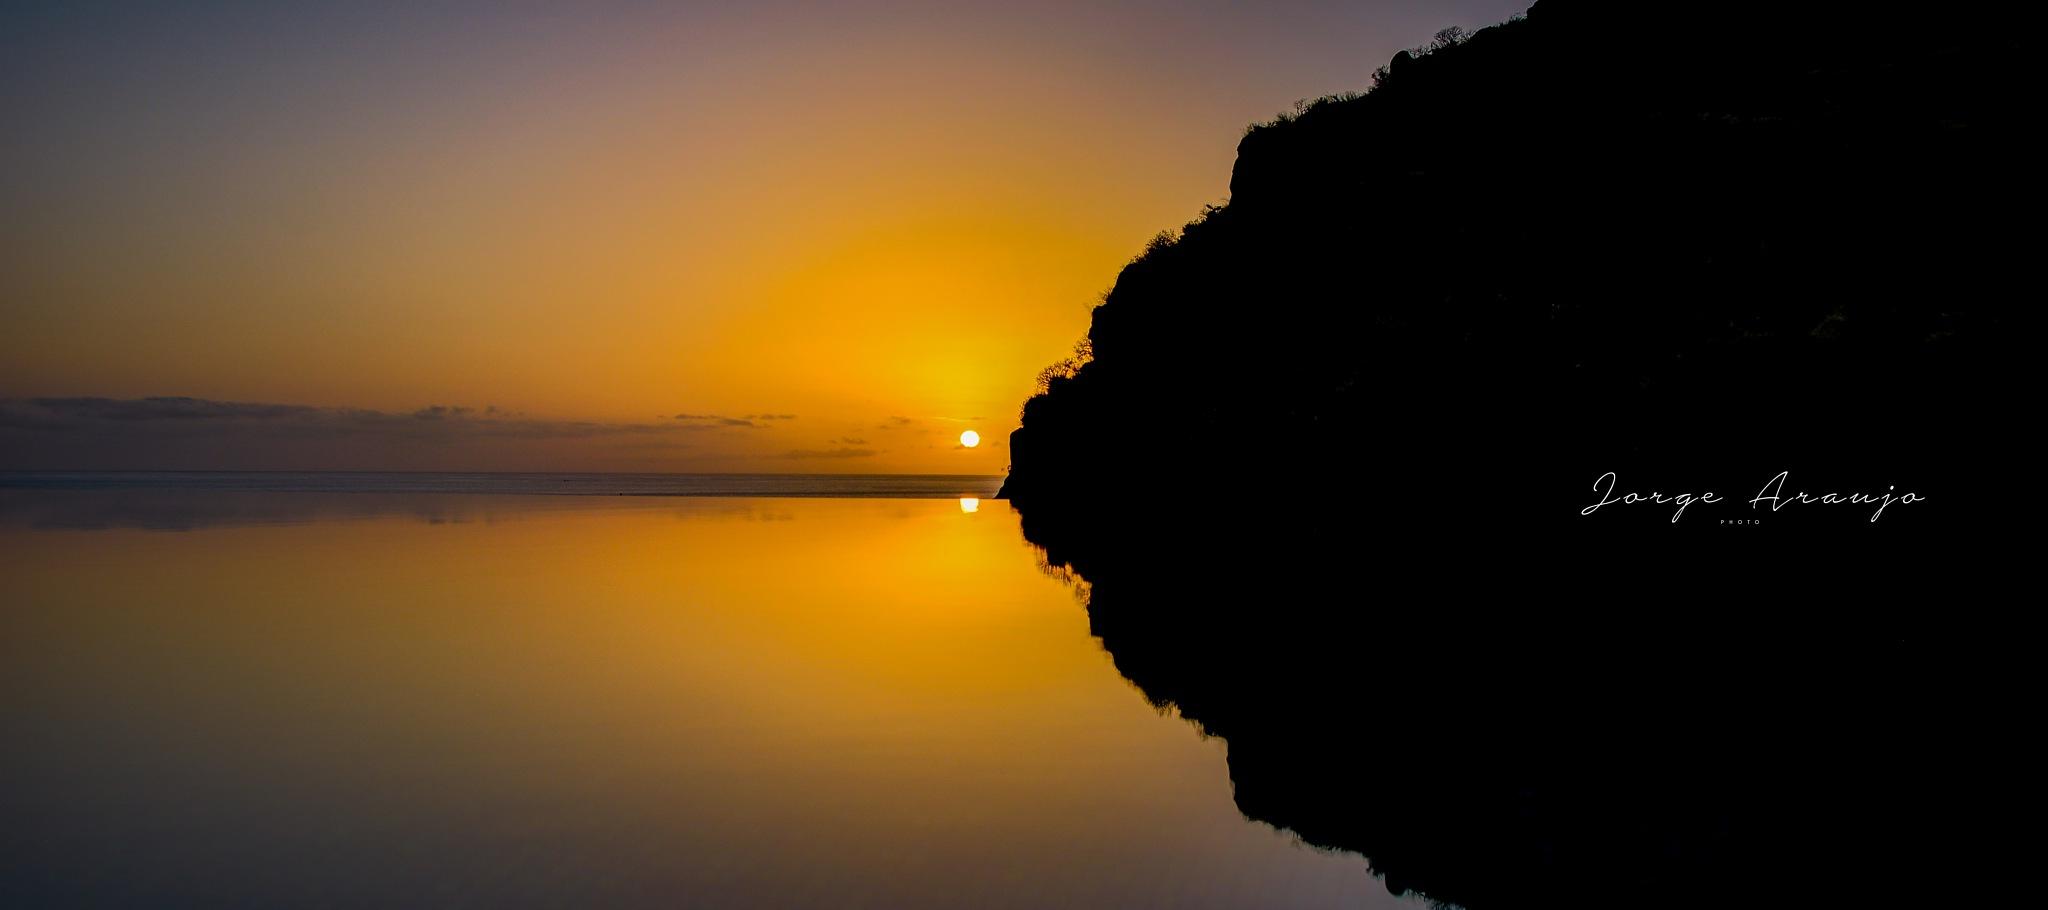 Sunset at swimming pool by Jorge Araújo